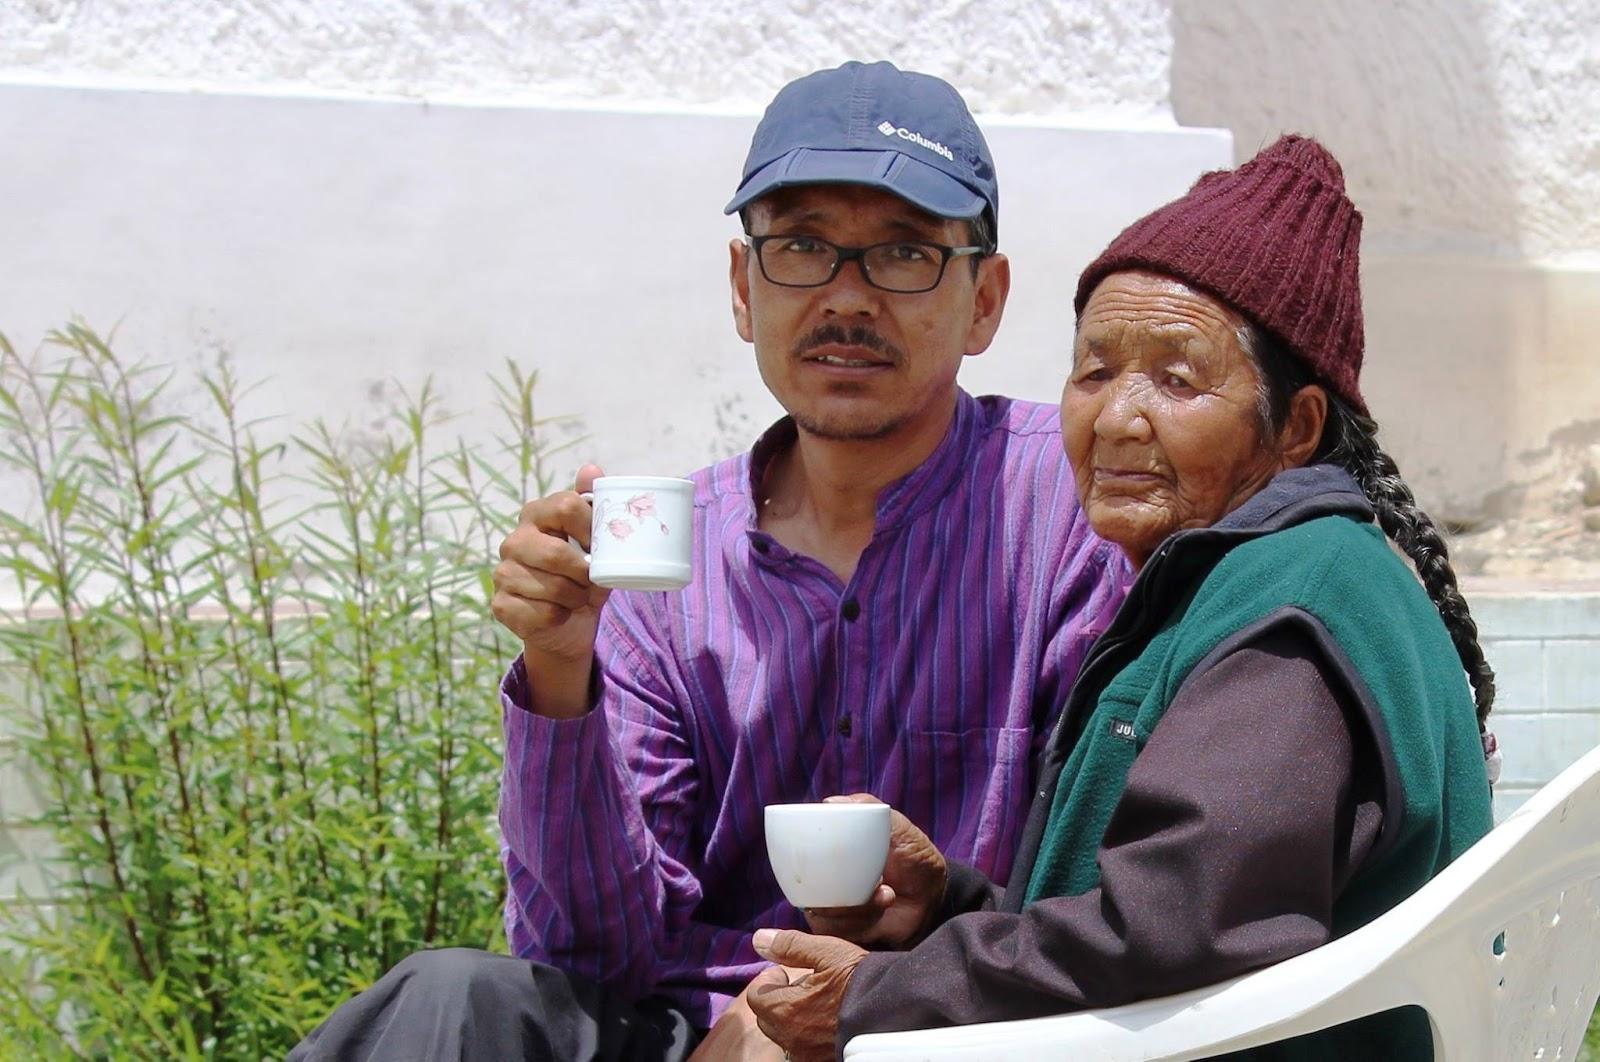 Sonam Wangchok: Selfless Son Of Ladakh